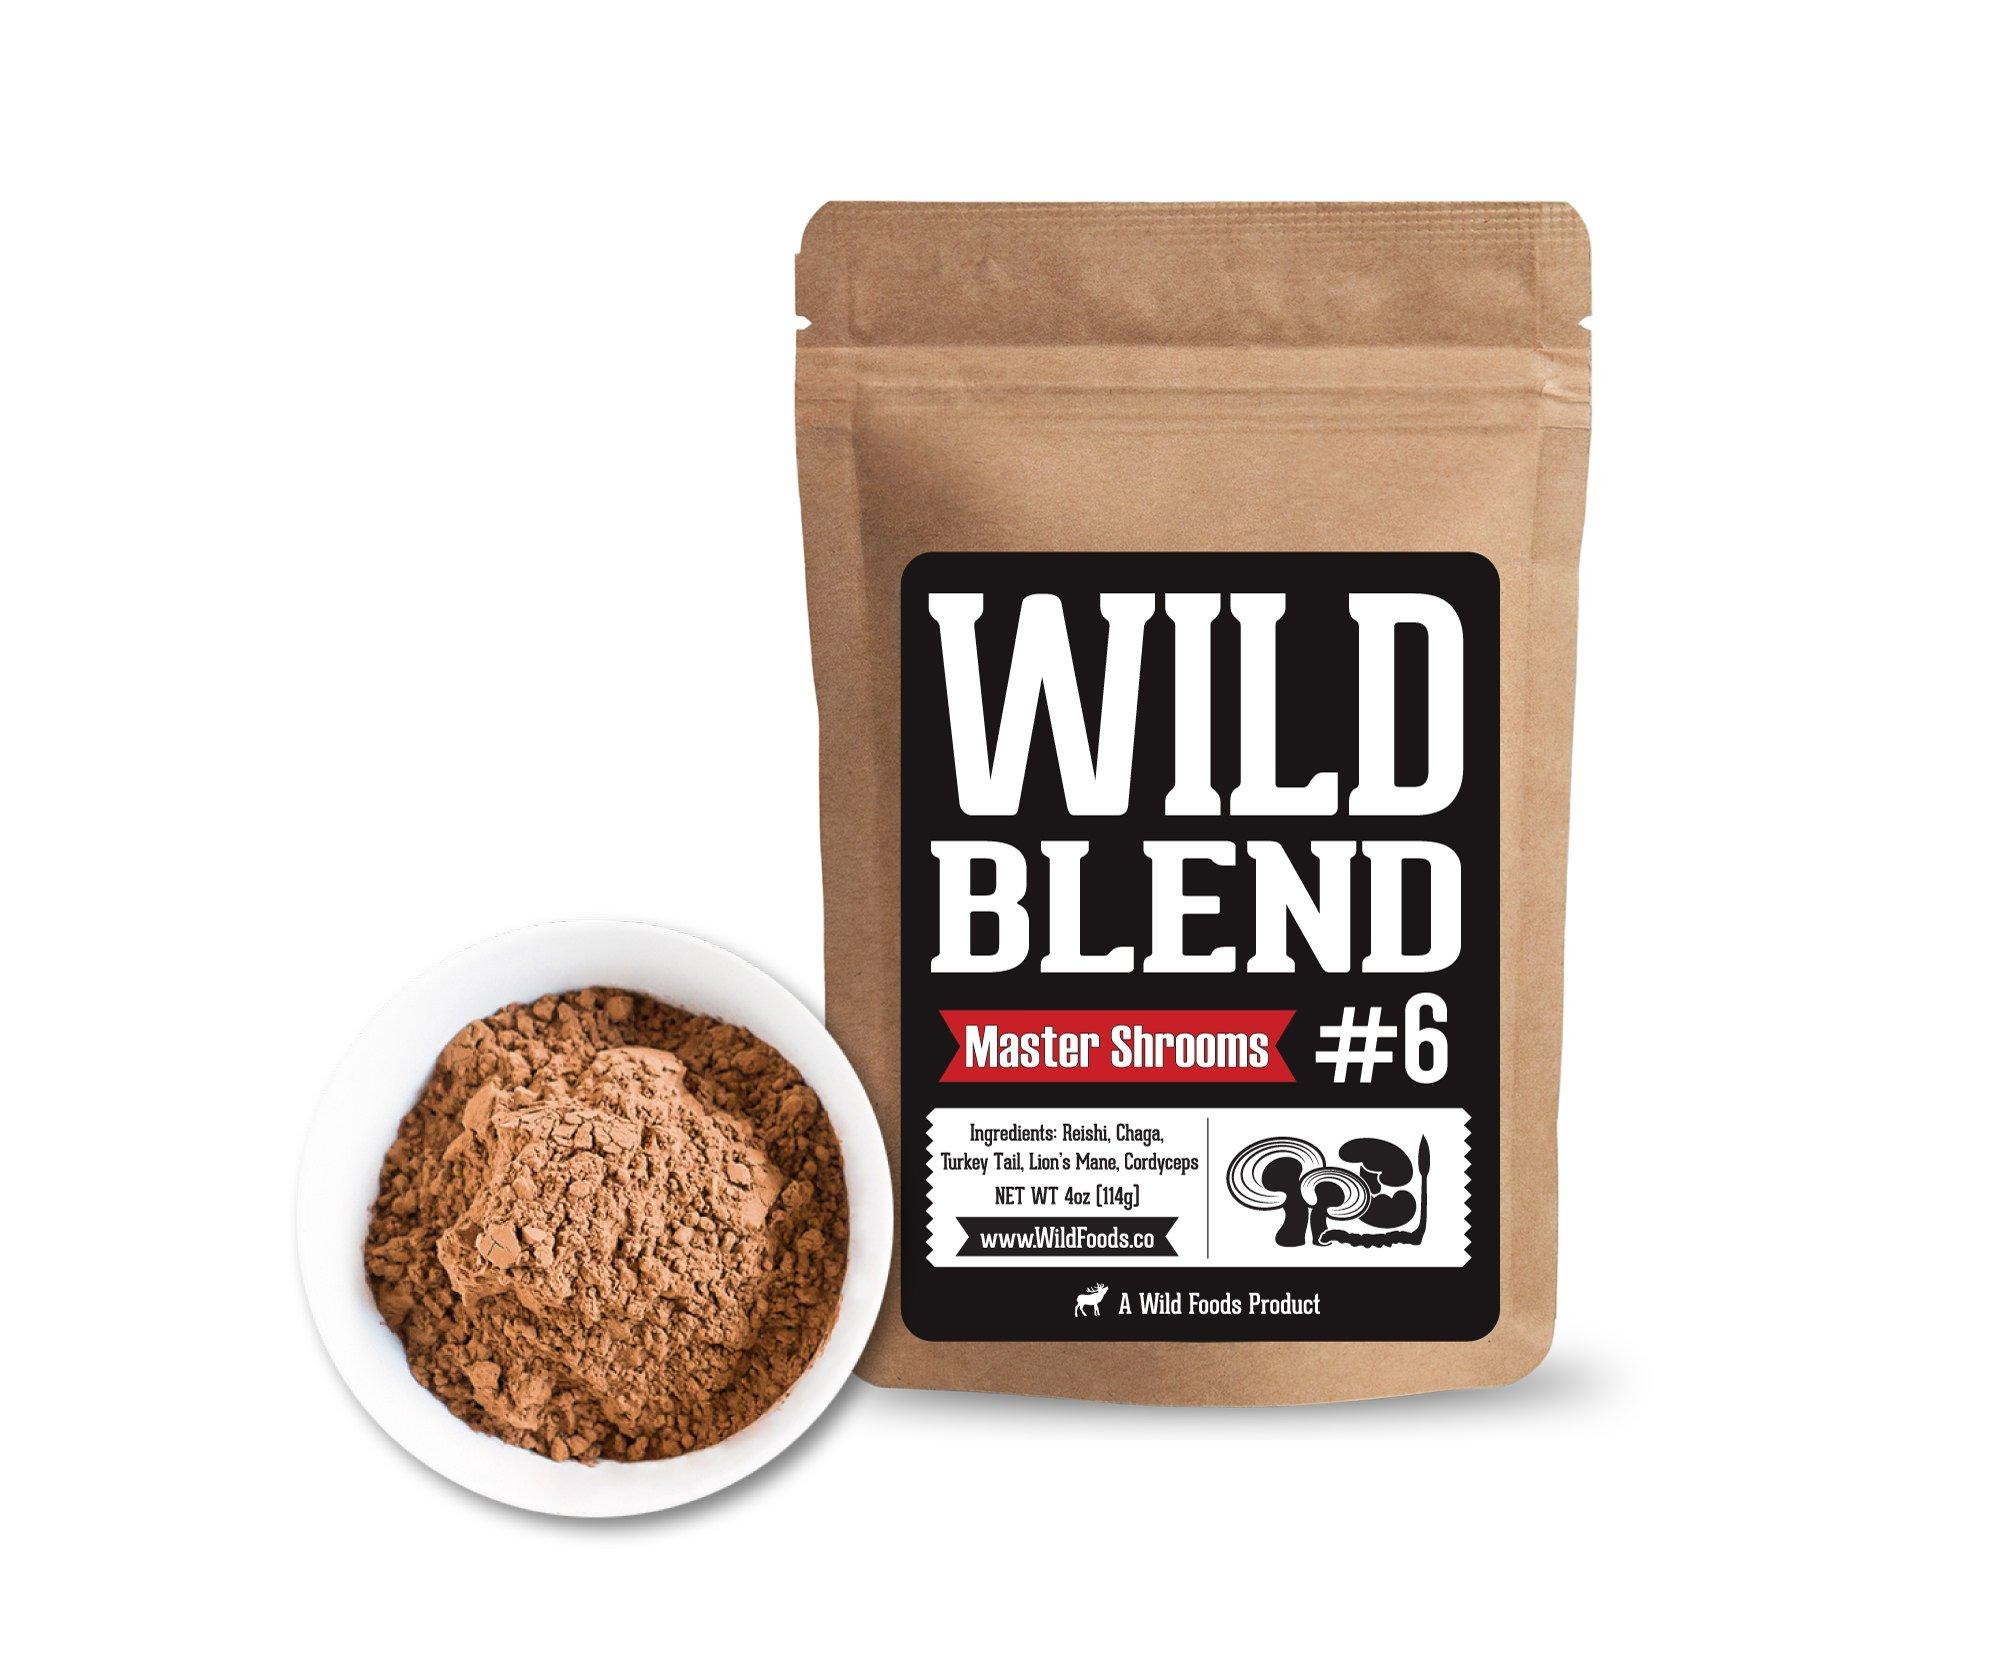 Wild Mushroom Extract Blend, Reishi, Chaga, Cordyceps, Turkey Tail, Lion's Mane Supplement for Smoothies, Shakes, Coffee Nootropic Mental Performance (Master Blend 4 oz)